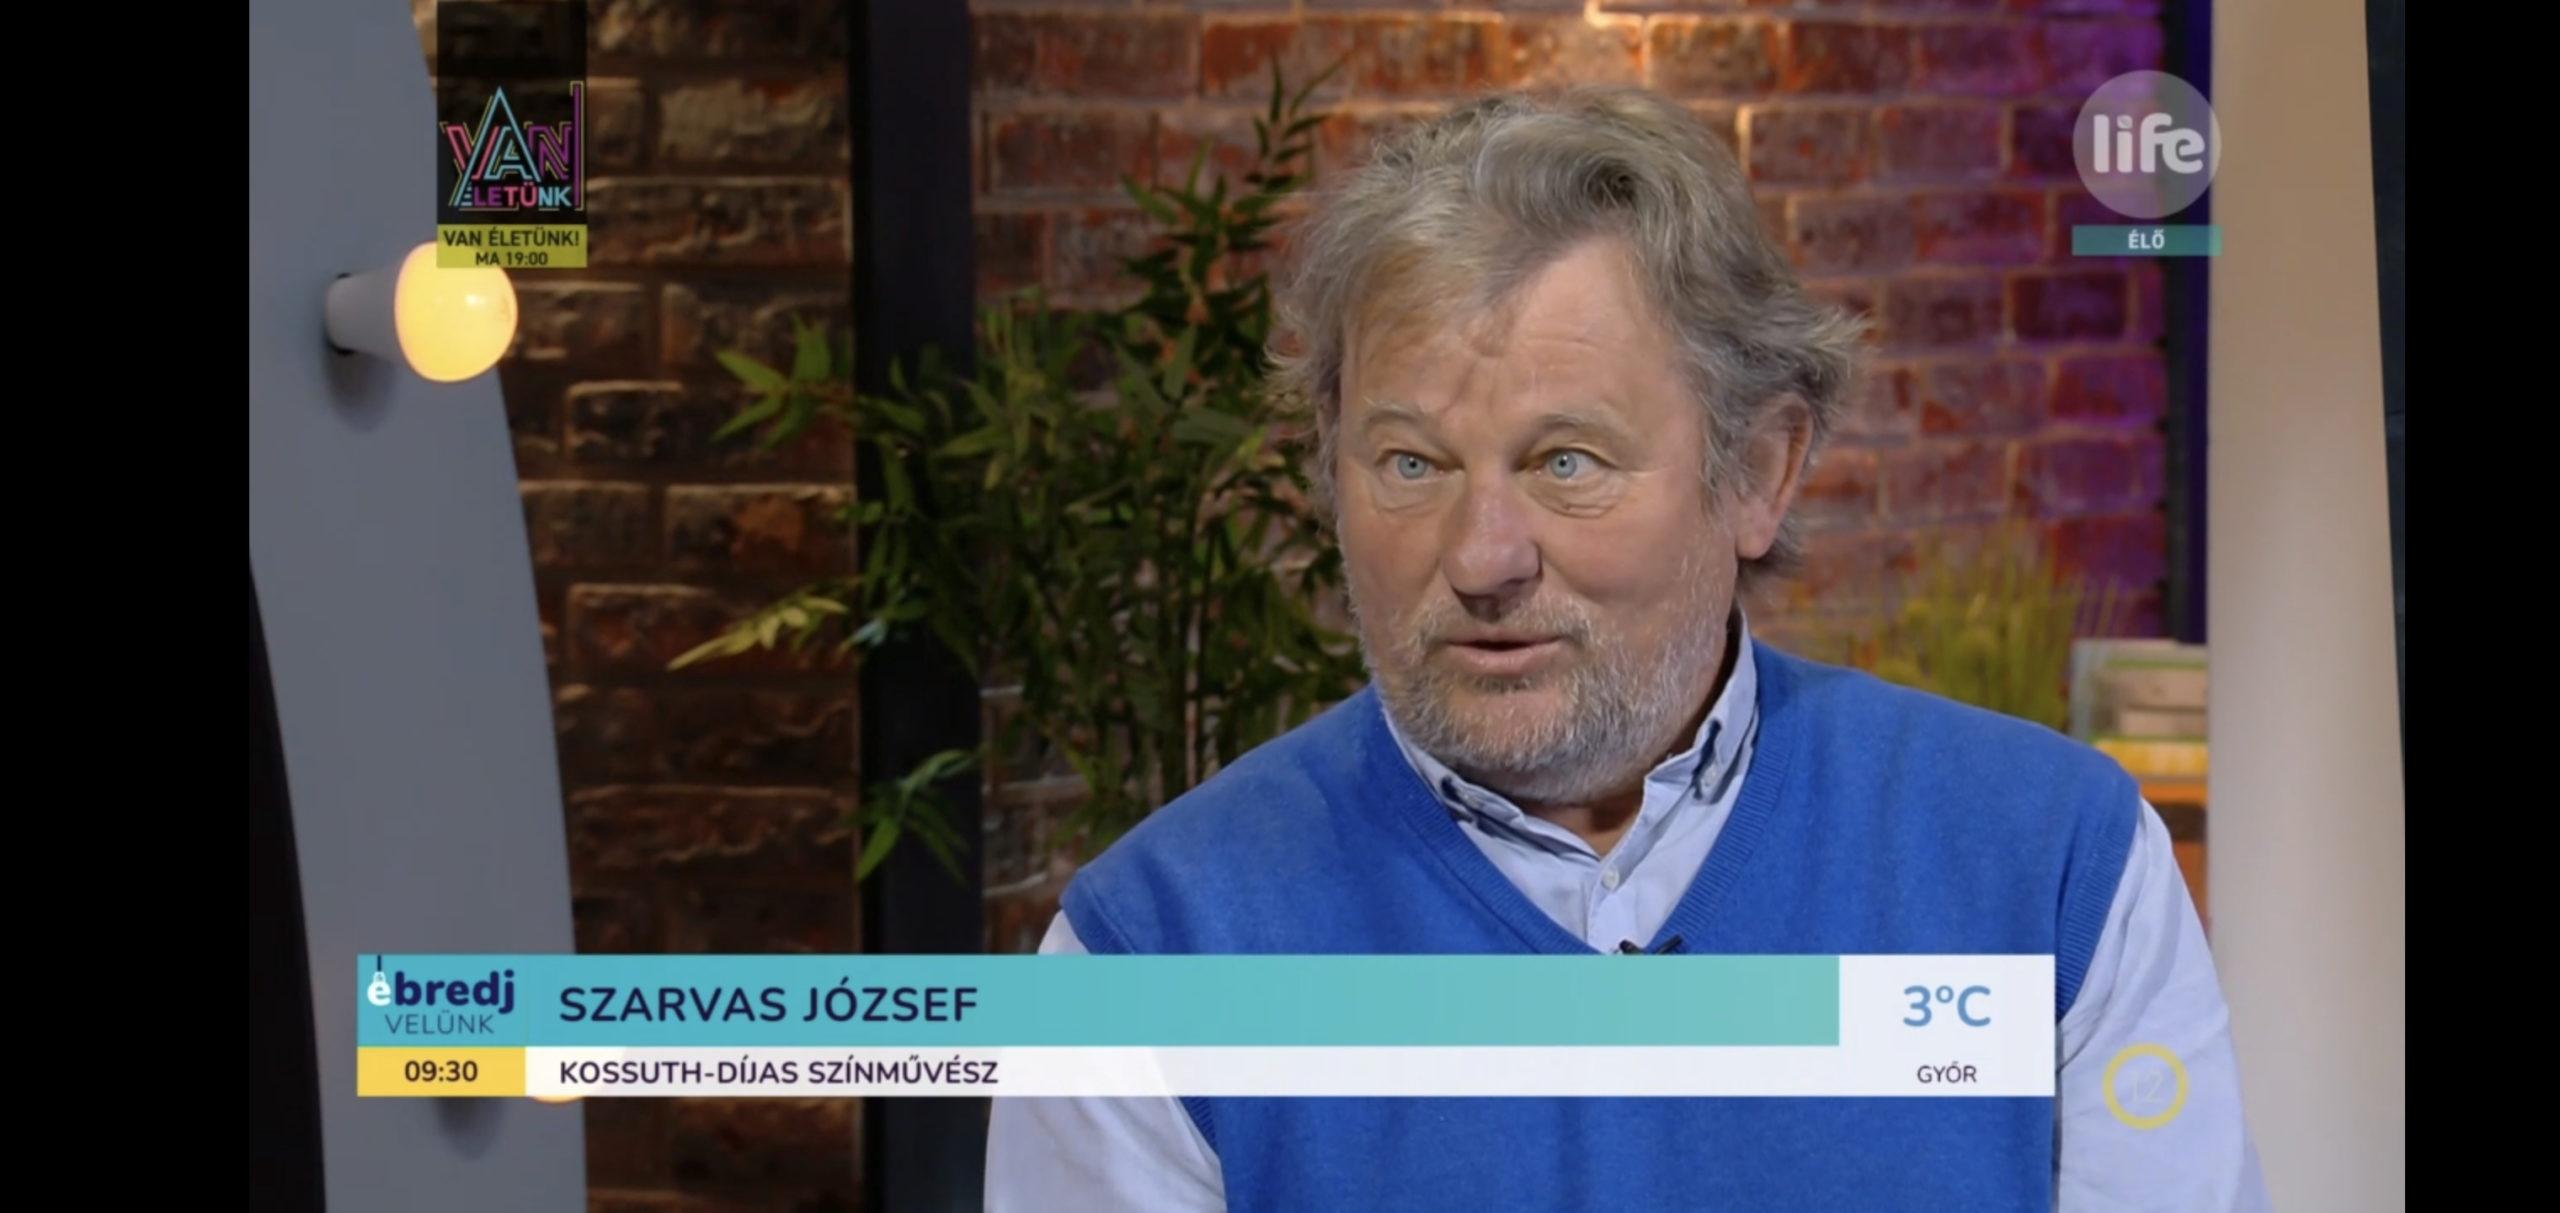 Szarvas József Kossuth-díjas